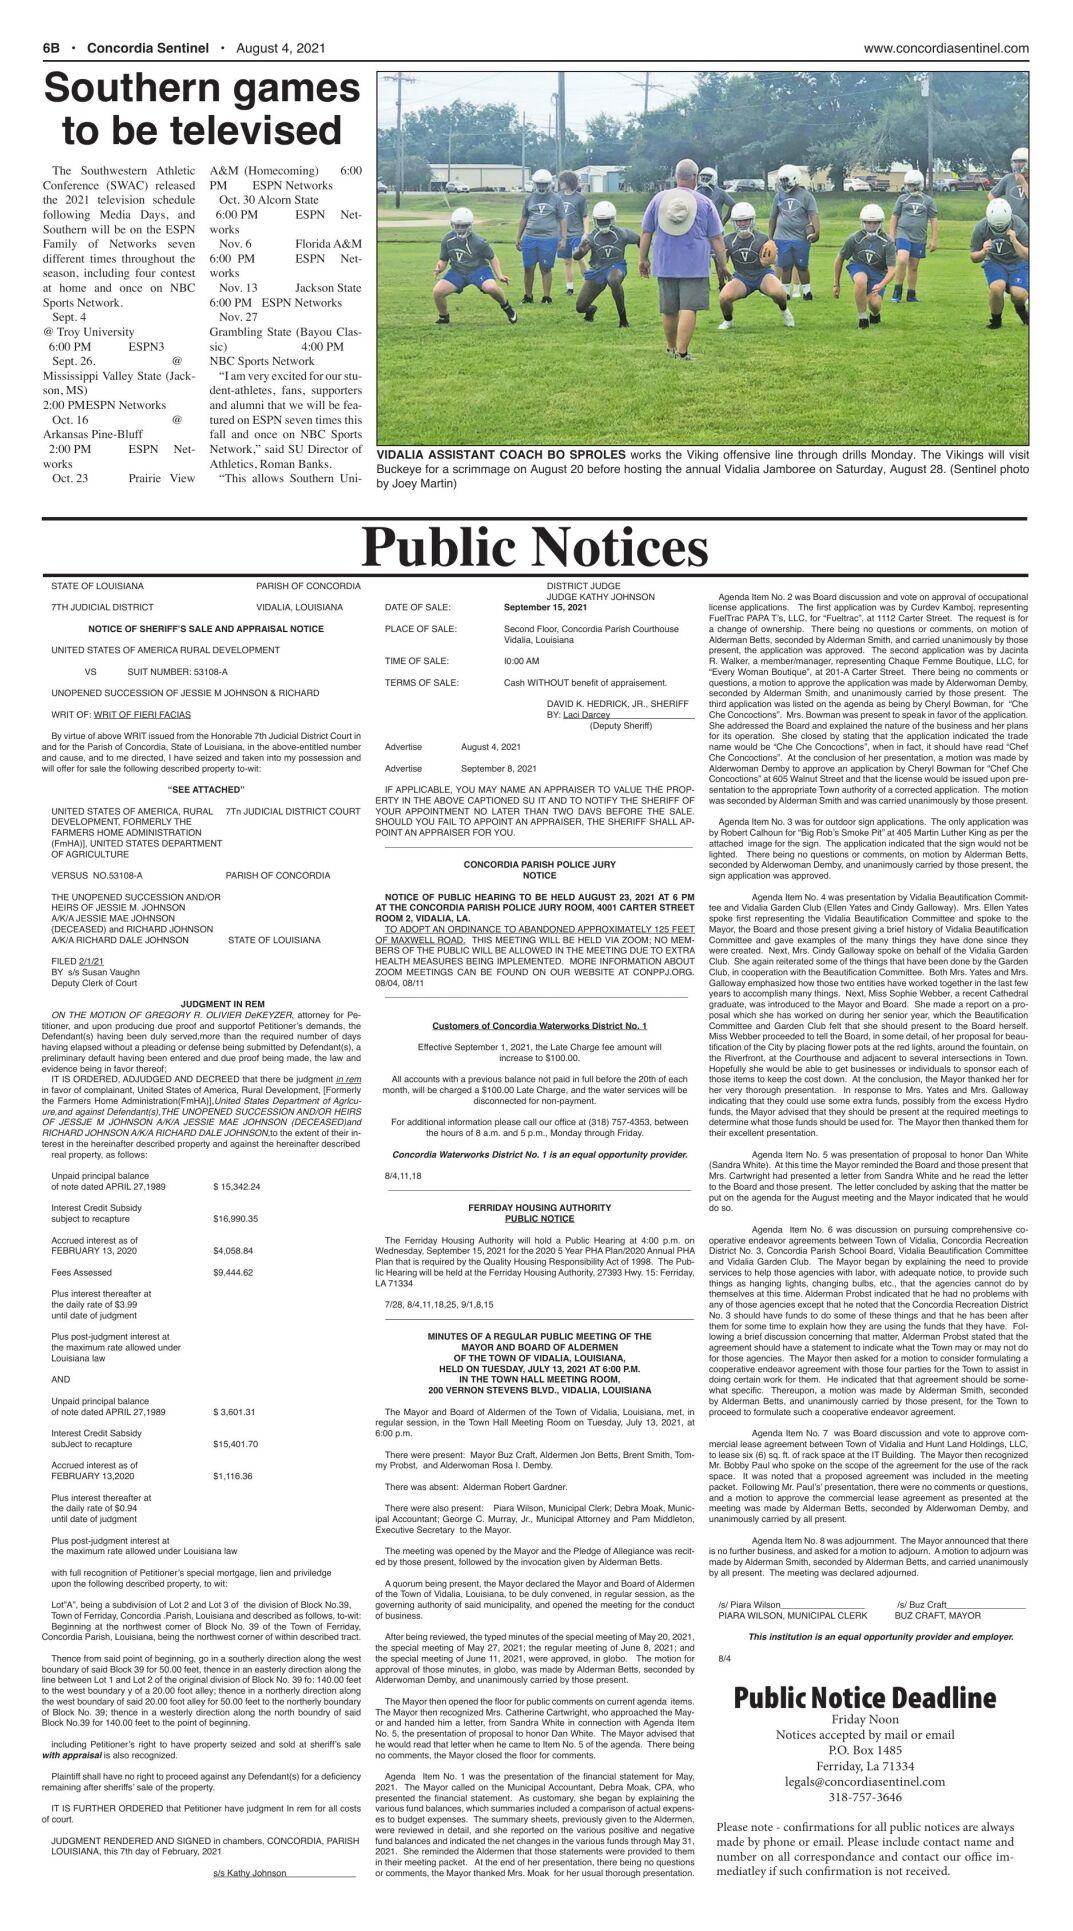 Public Notices - August 4, 2021